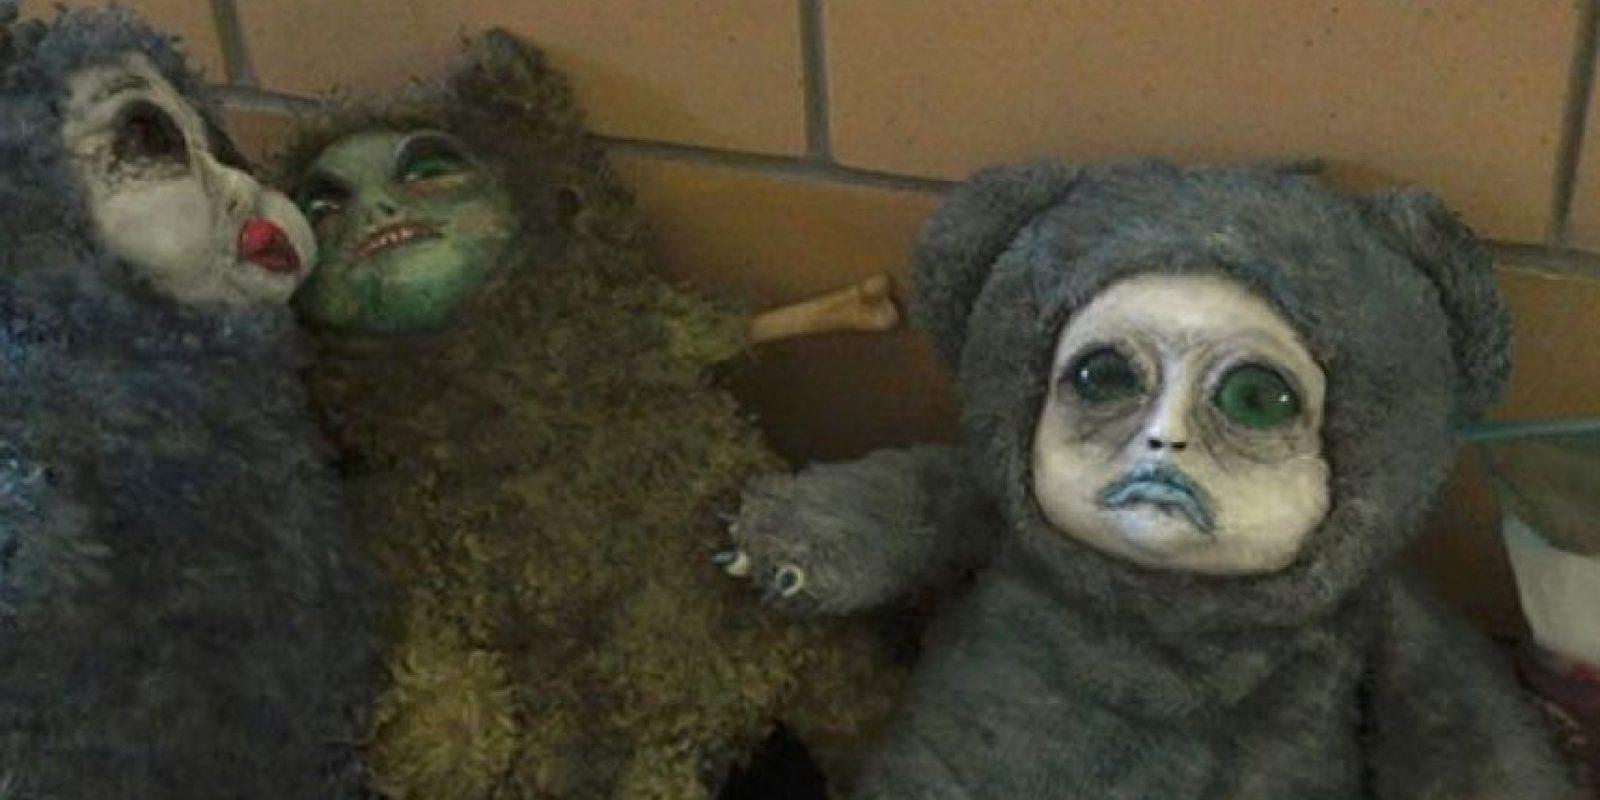 Ewoks zombies para alimentar sus pesadillas Foto:Reddit